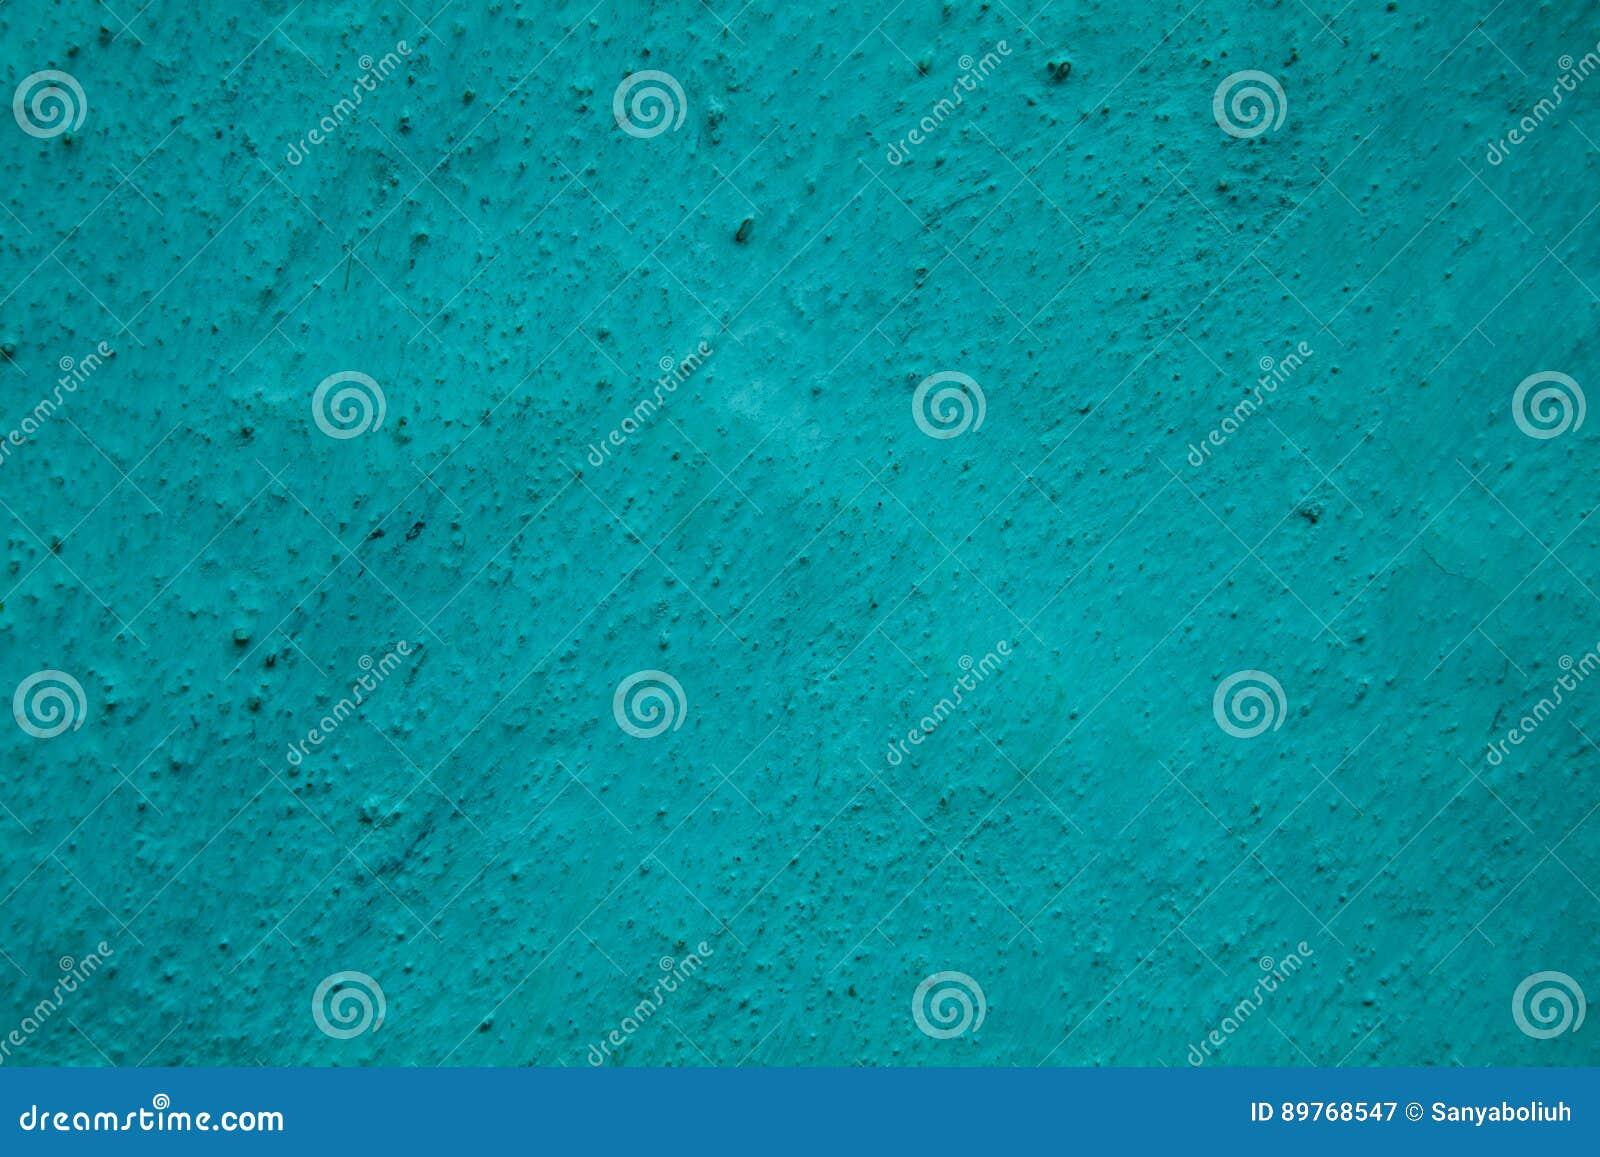 Parede textured grunge pontilhada turquesa